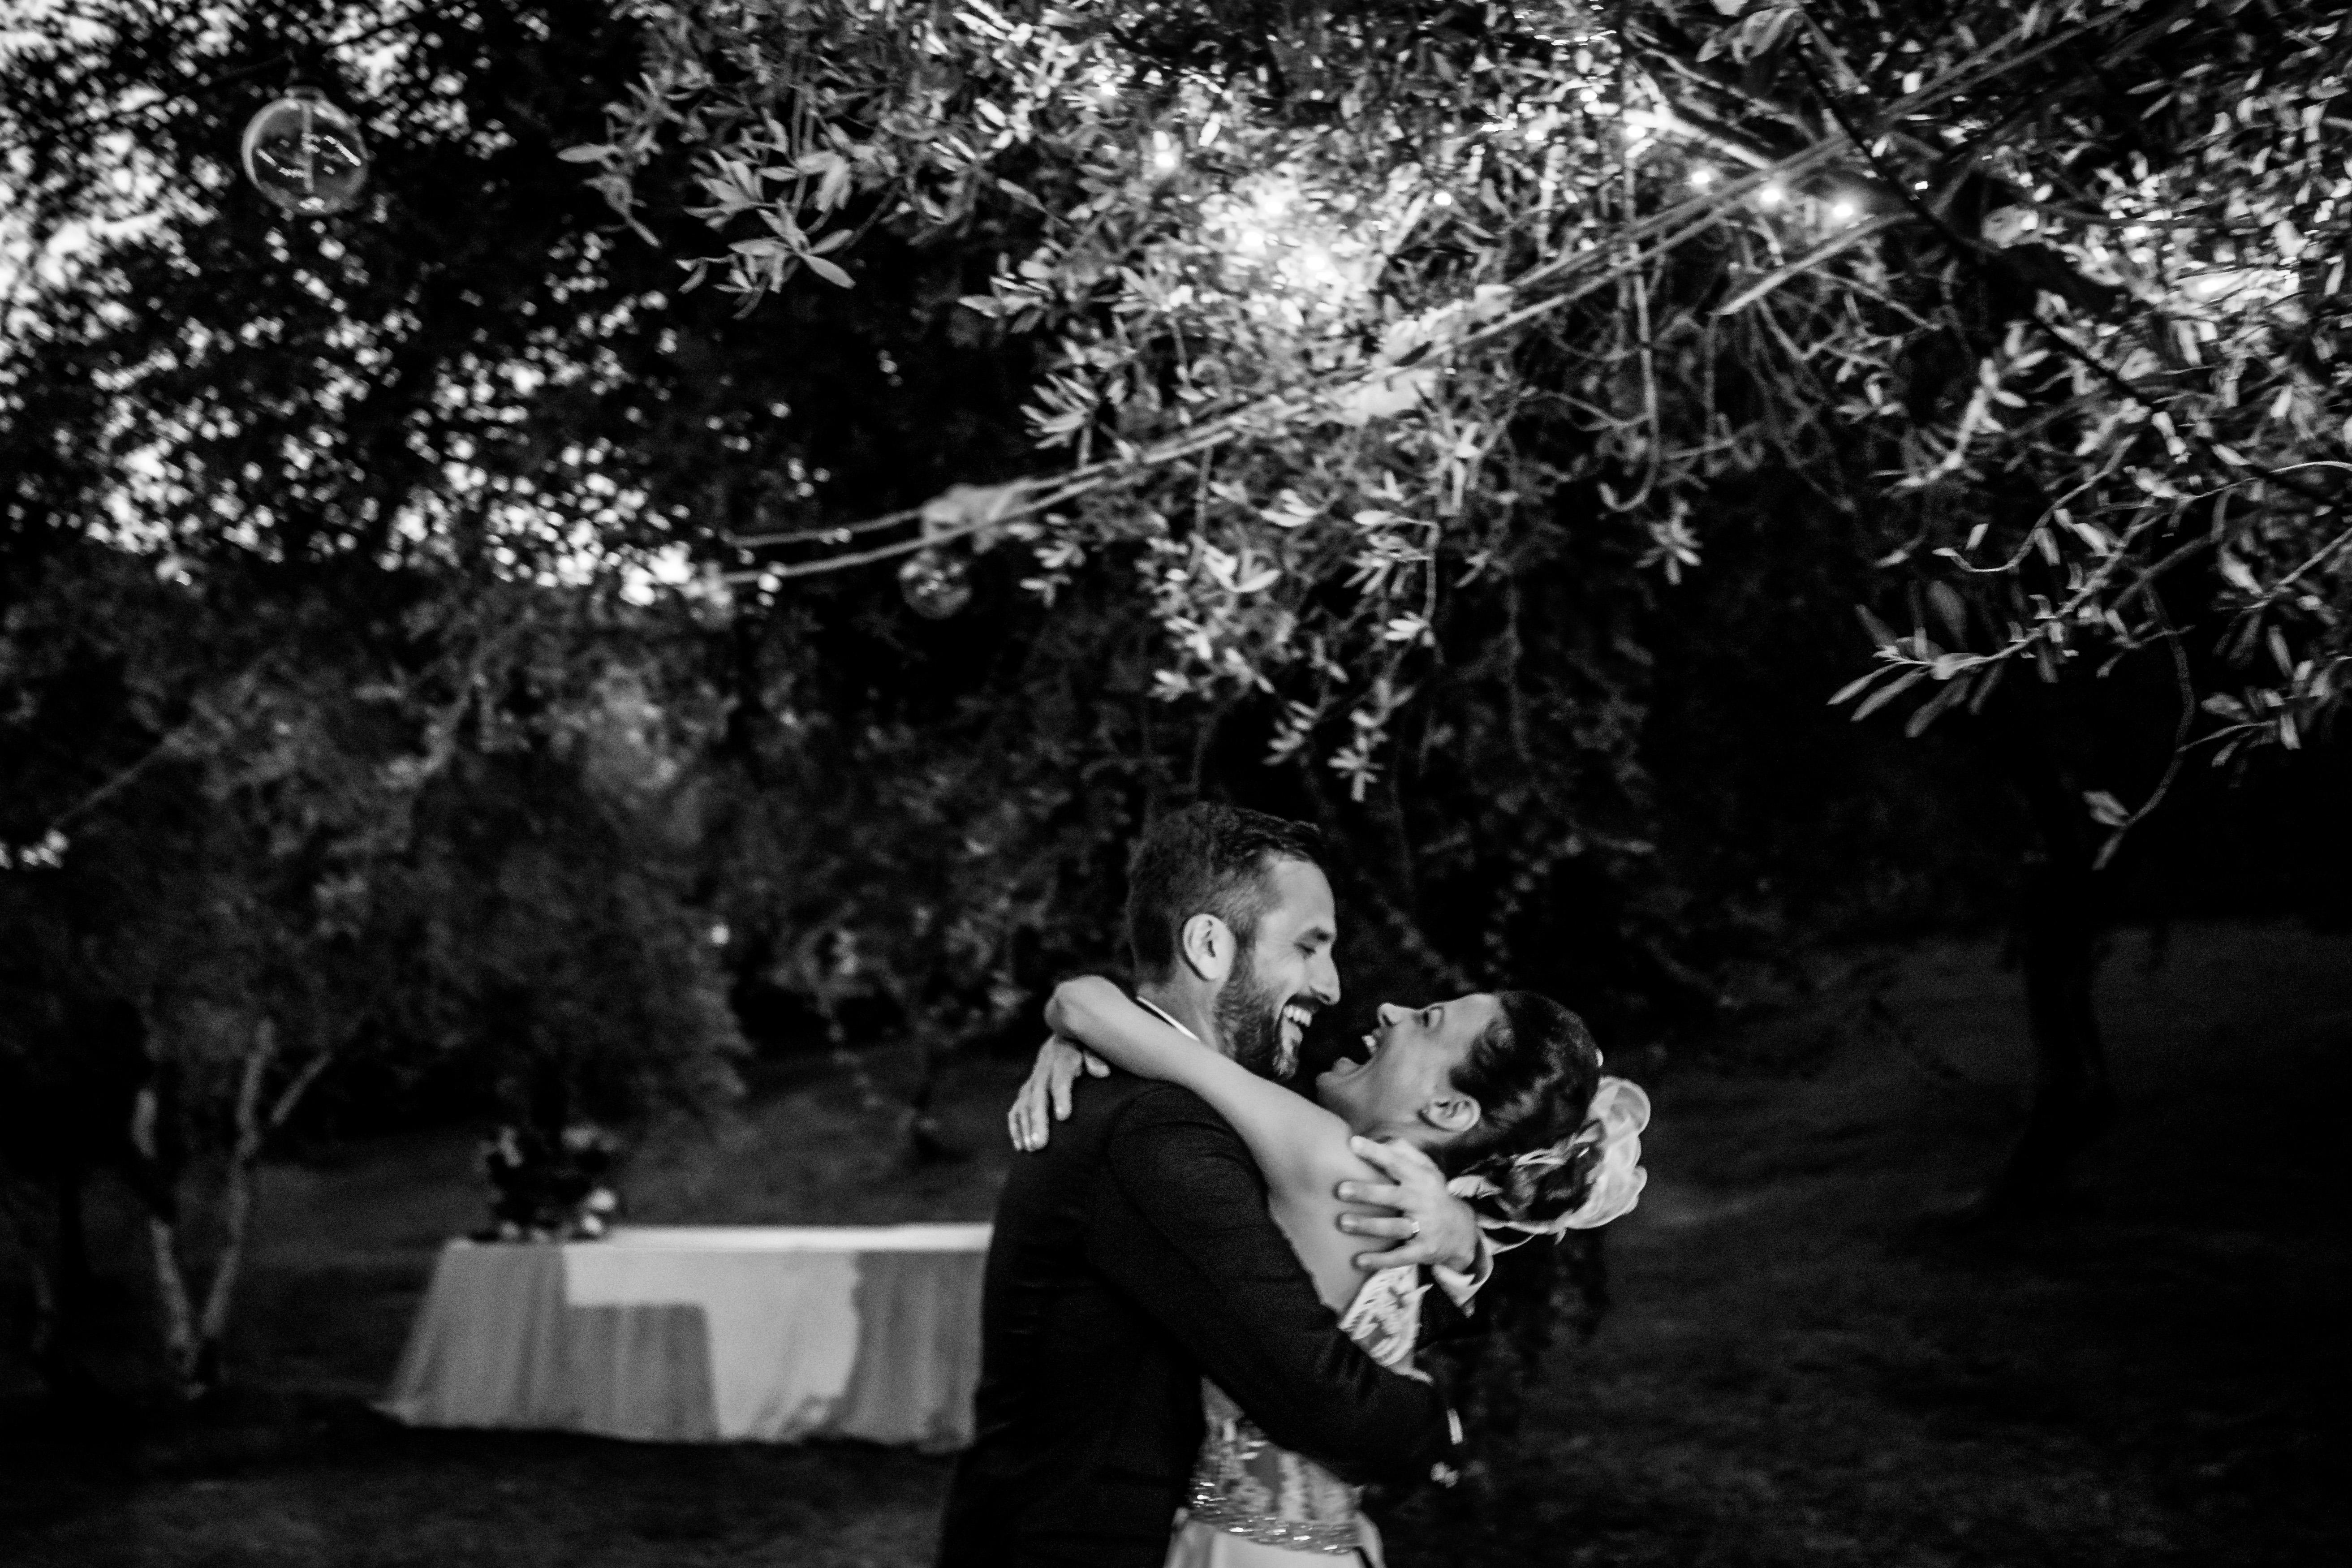 0029_gilberti_ricca_castello_oldofredi_montisola_fotografi_matrimonio